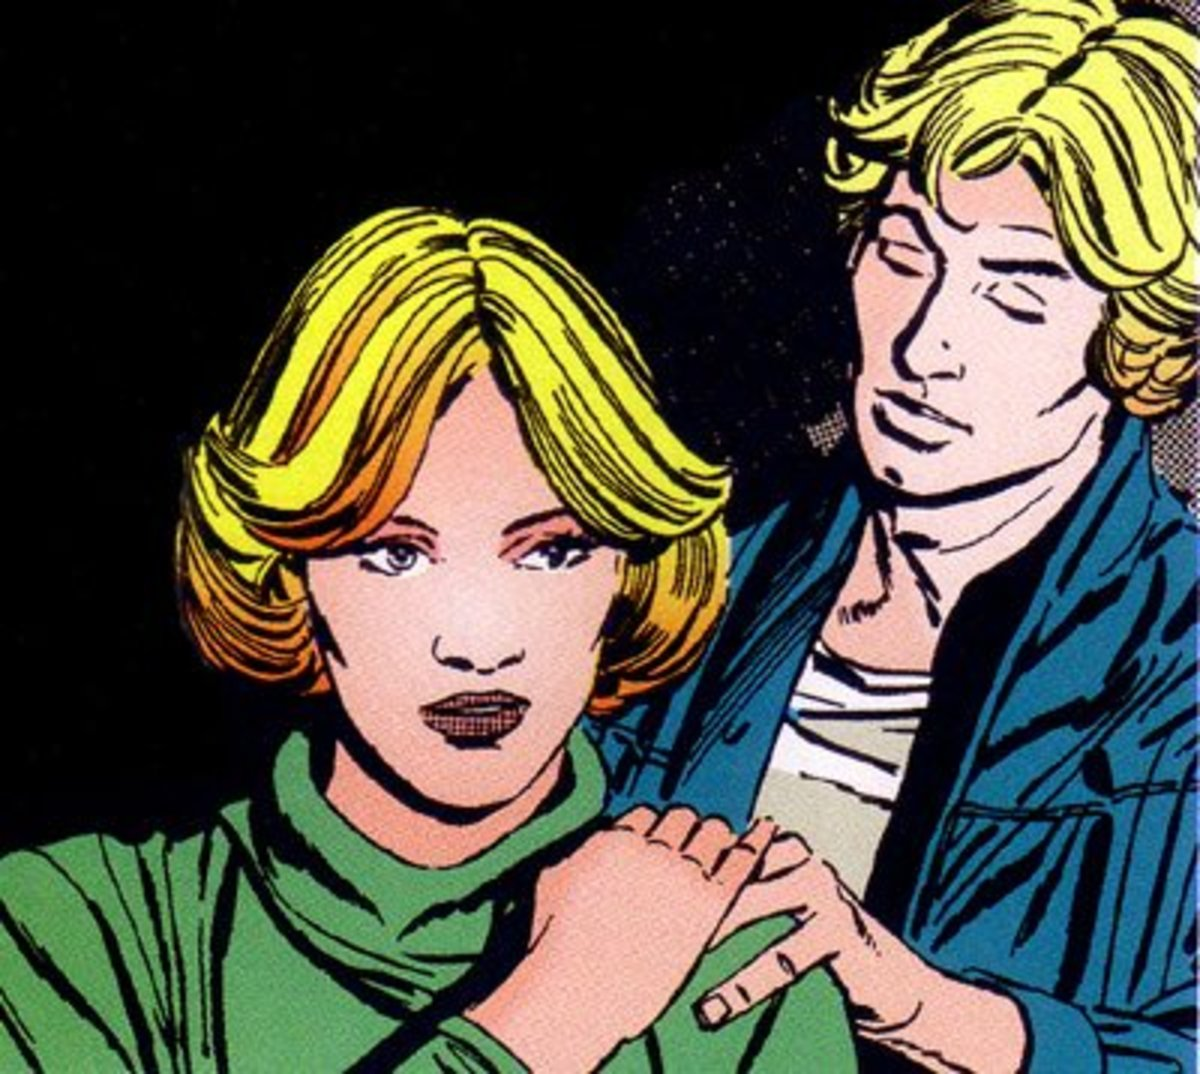 Tanith and Luke